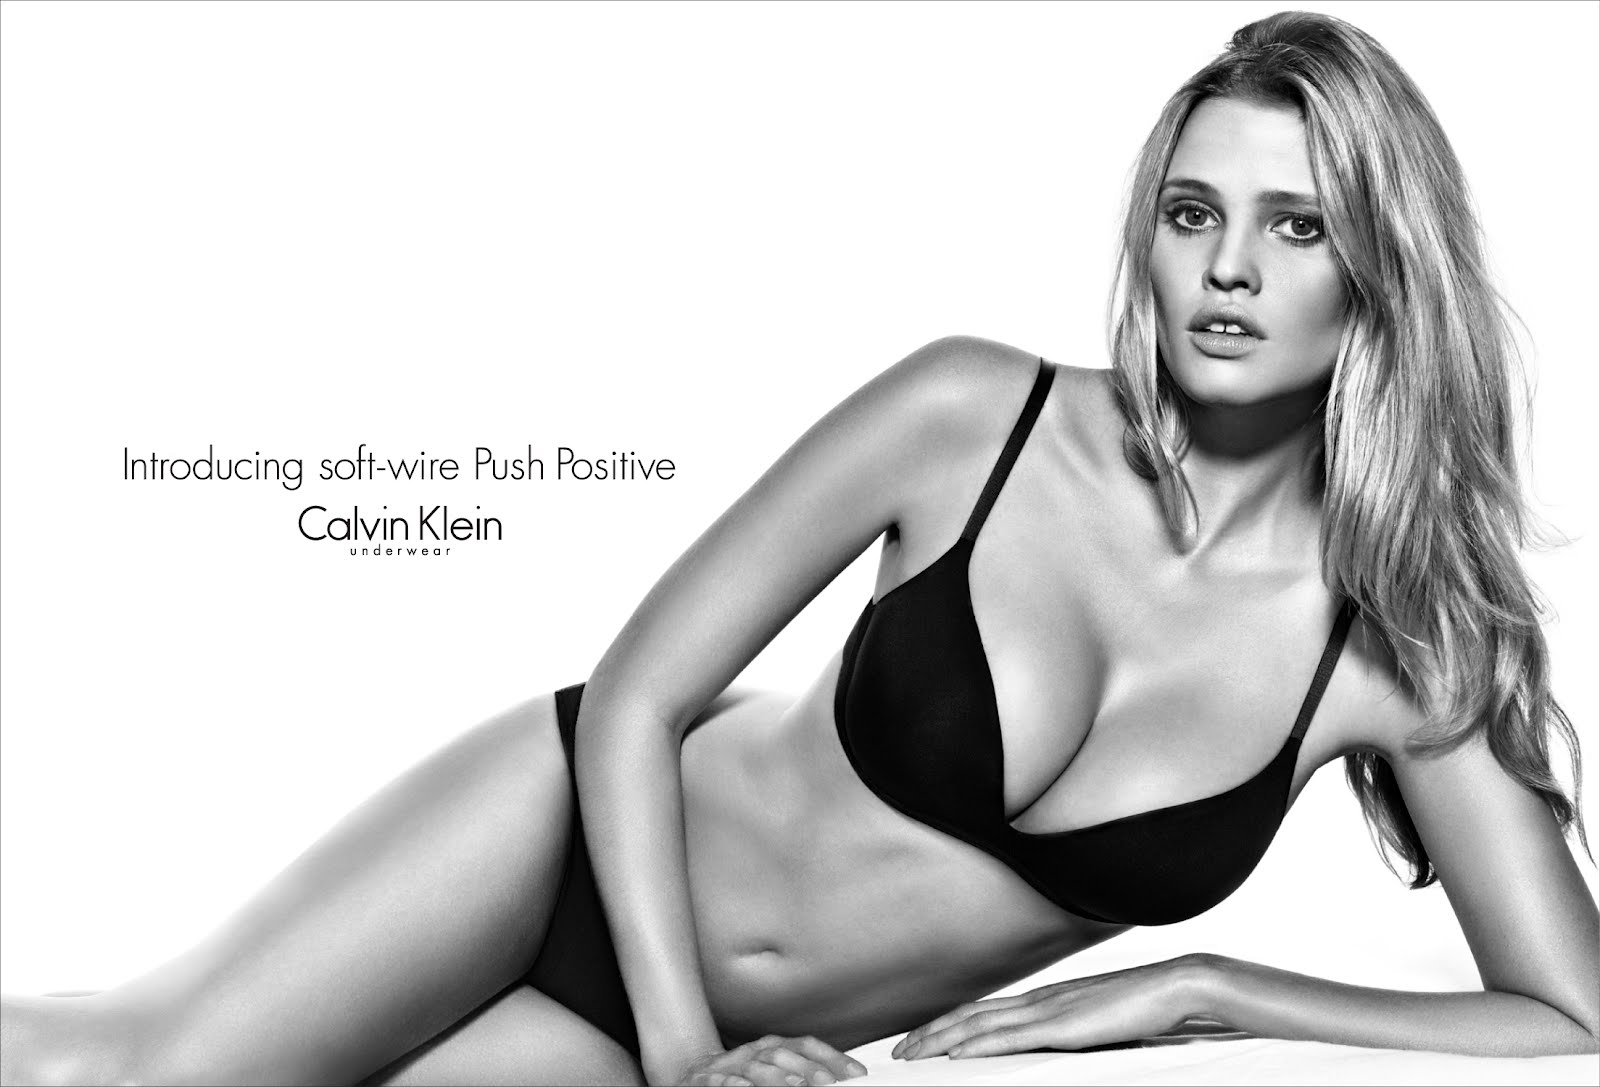 Hong Kong Positive Push Klein Calvin Fashion Geek UUqrw